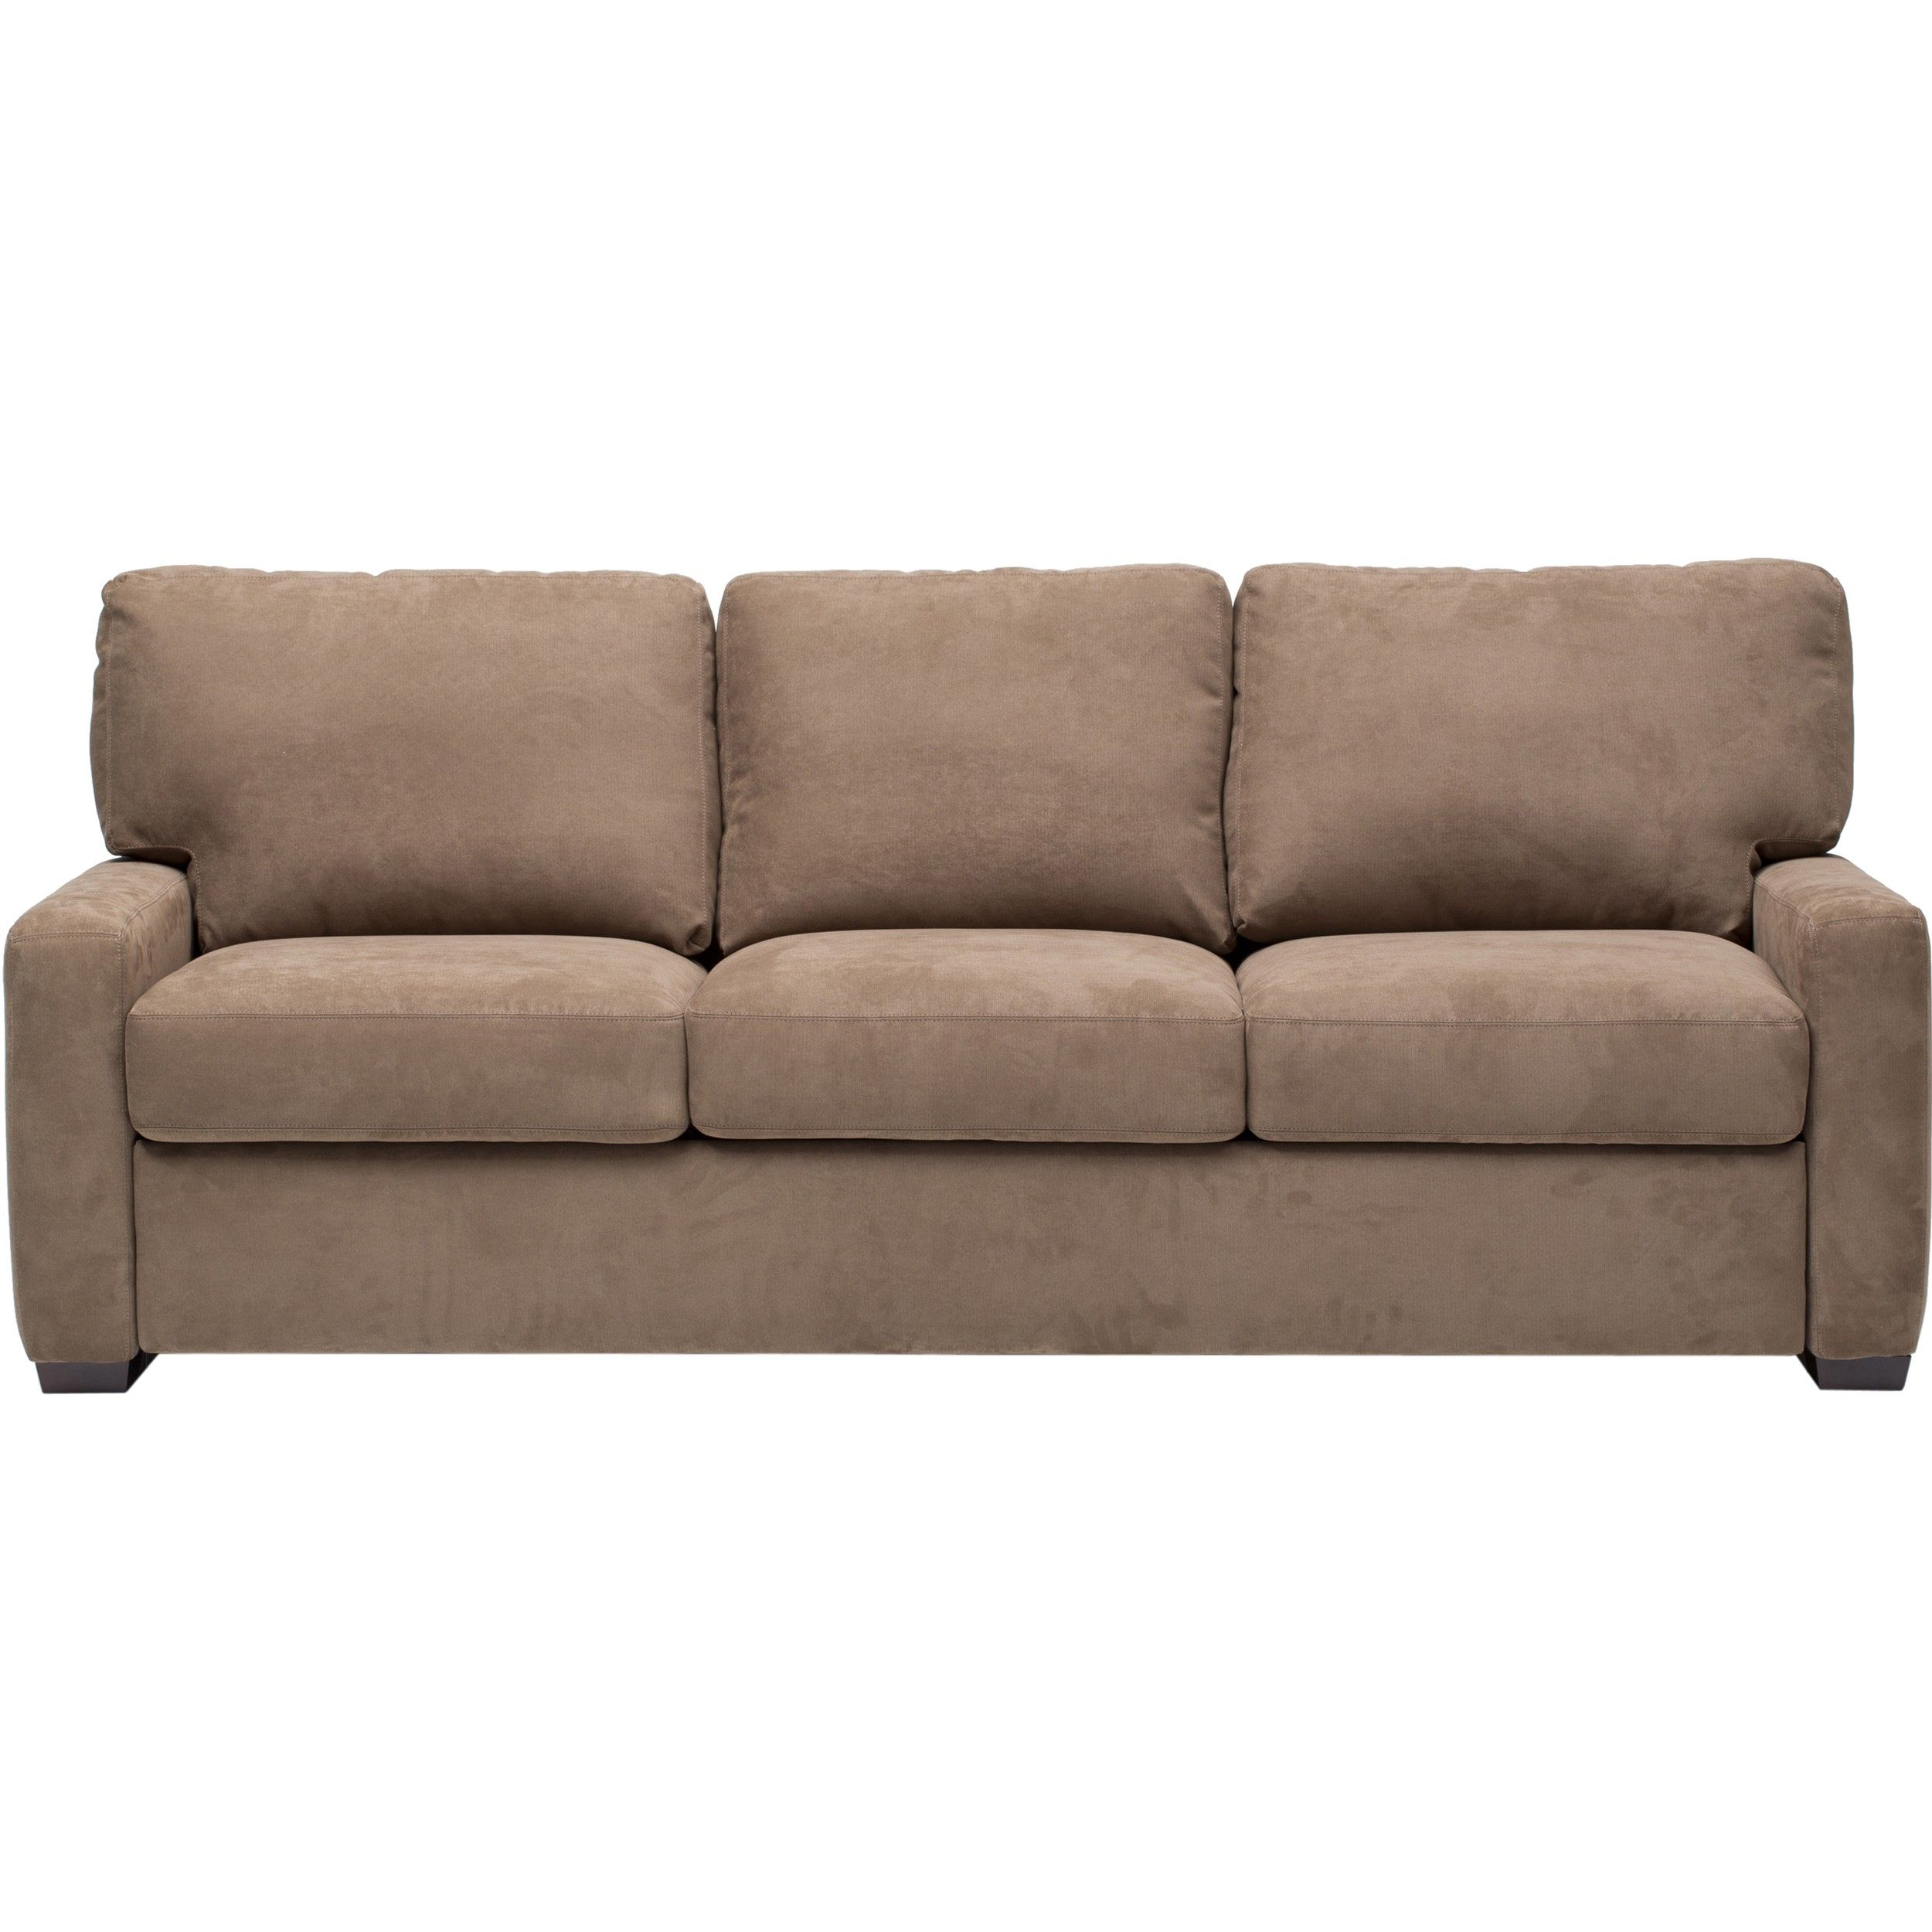 Cassidy 3 Seater Tempurpedic King Sleeper 4 999 00 Sofa